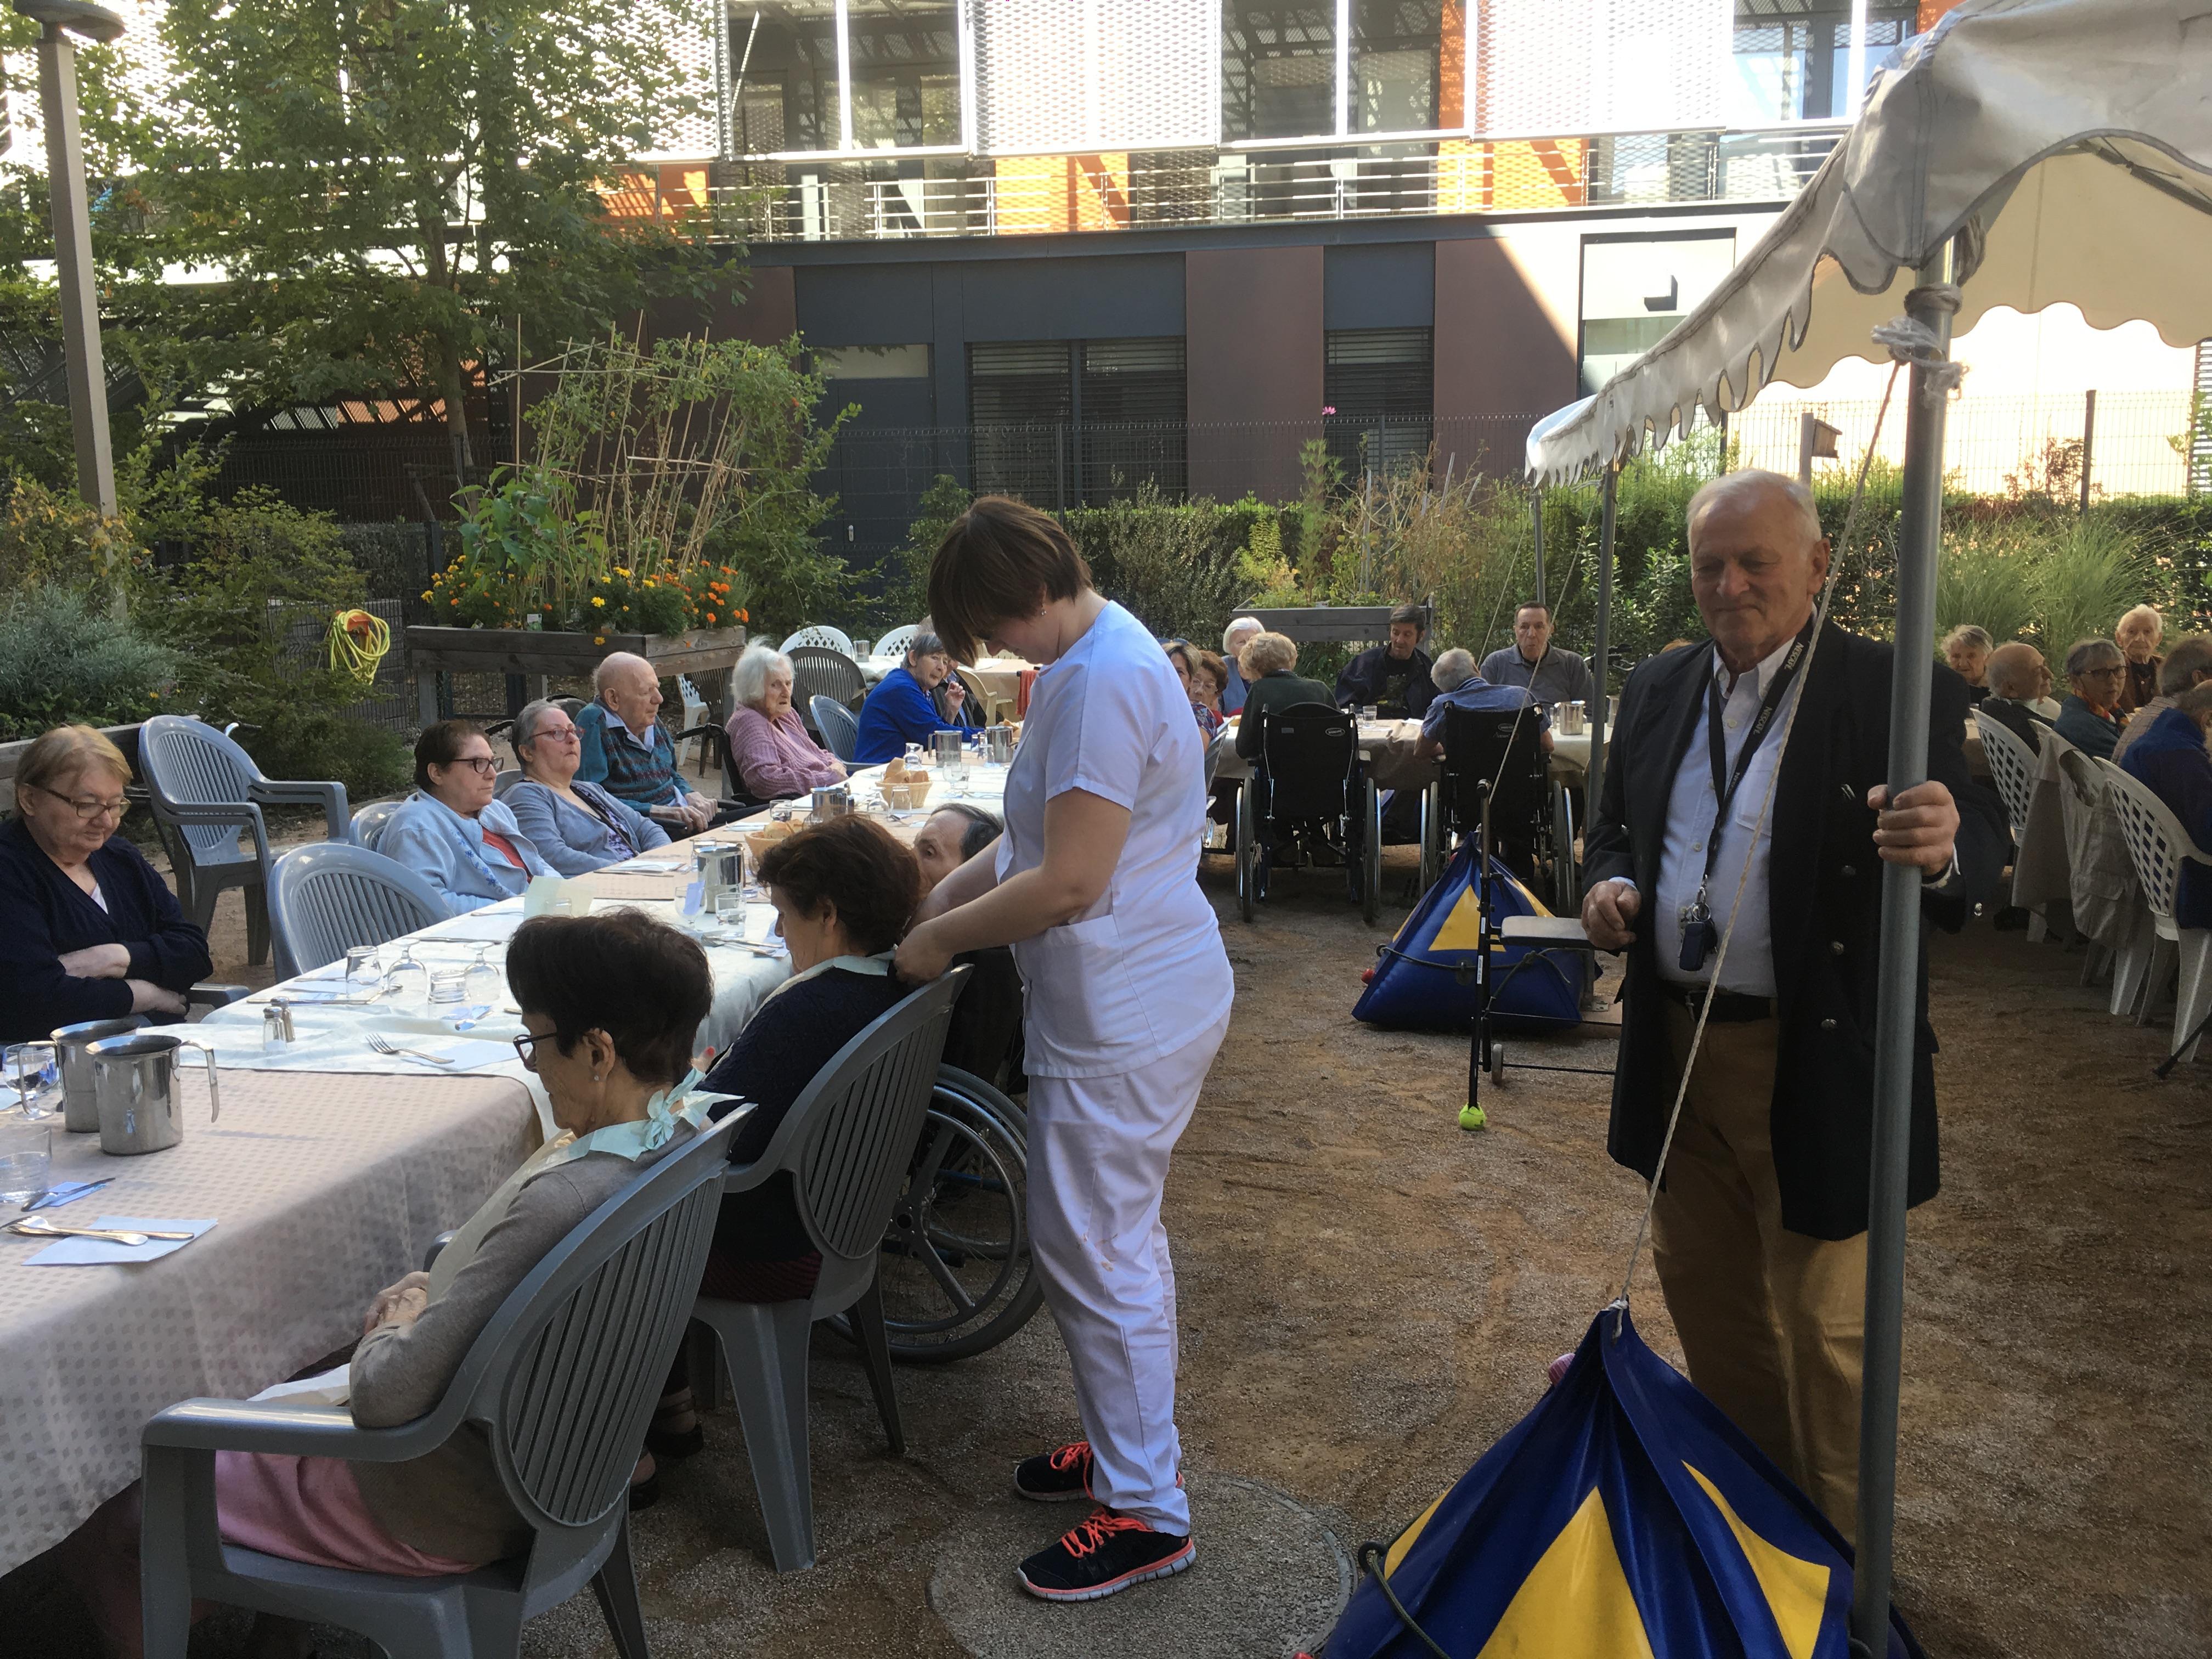 IMG-PRI-Barbecue_annuel002-G.ATHANASE-09-2019-CC